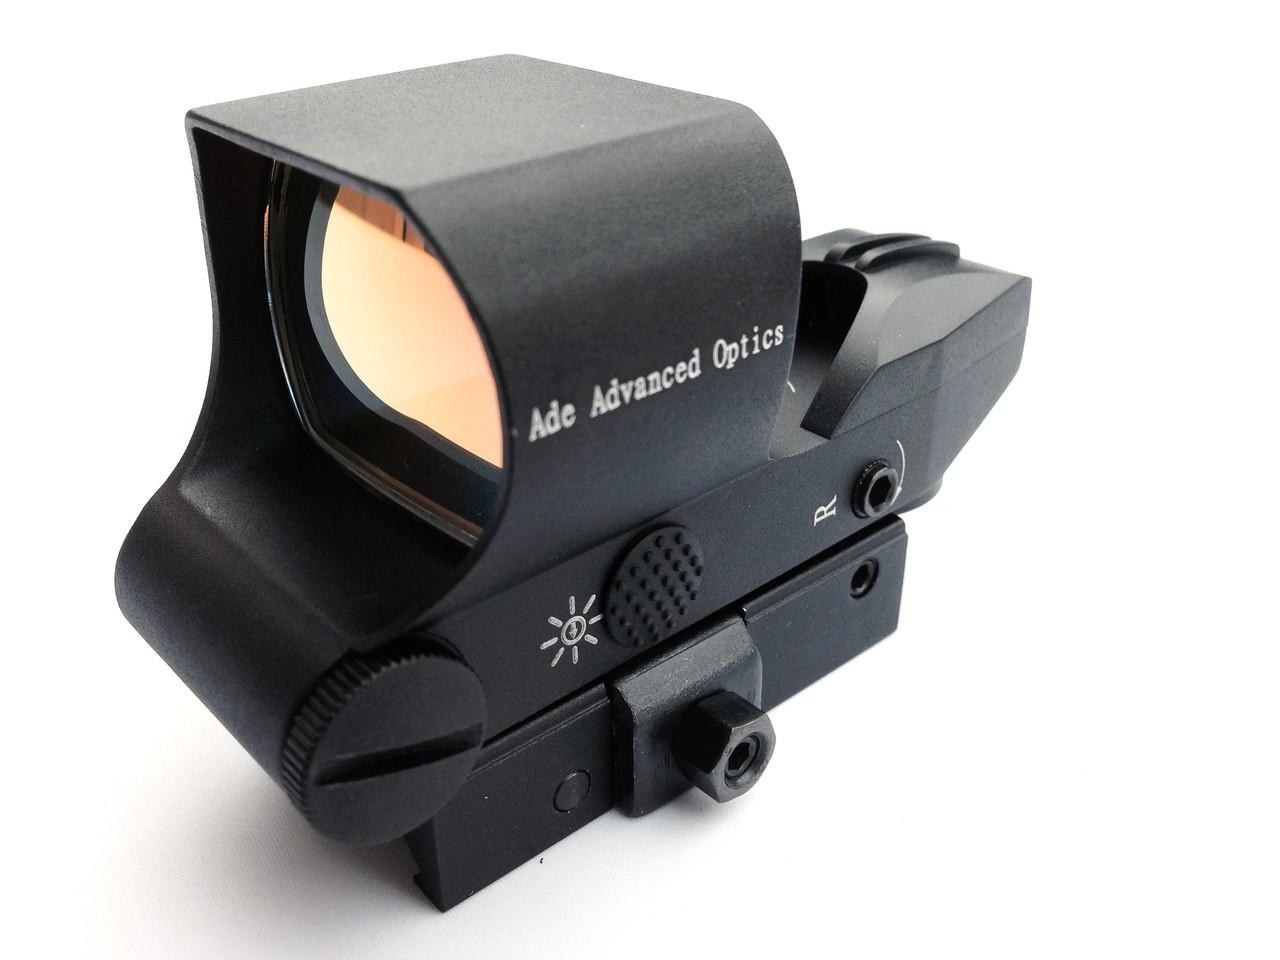 Ade Advanced Optics Red Dot Reflex Sight Reflex Sight